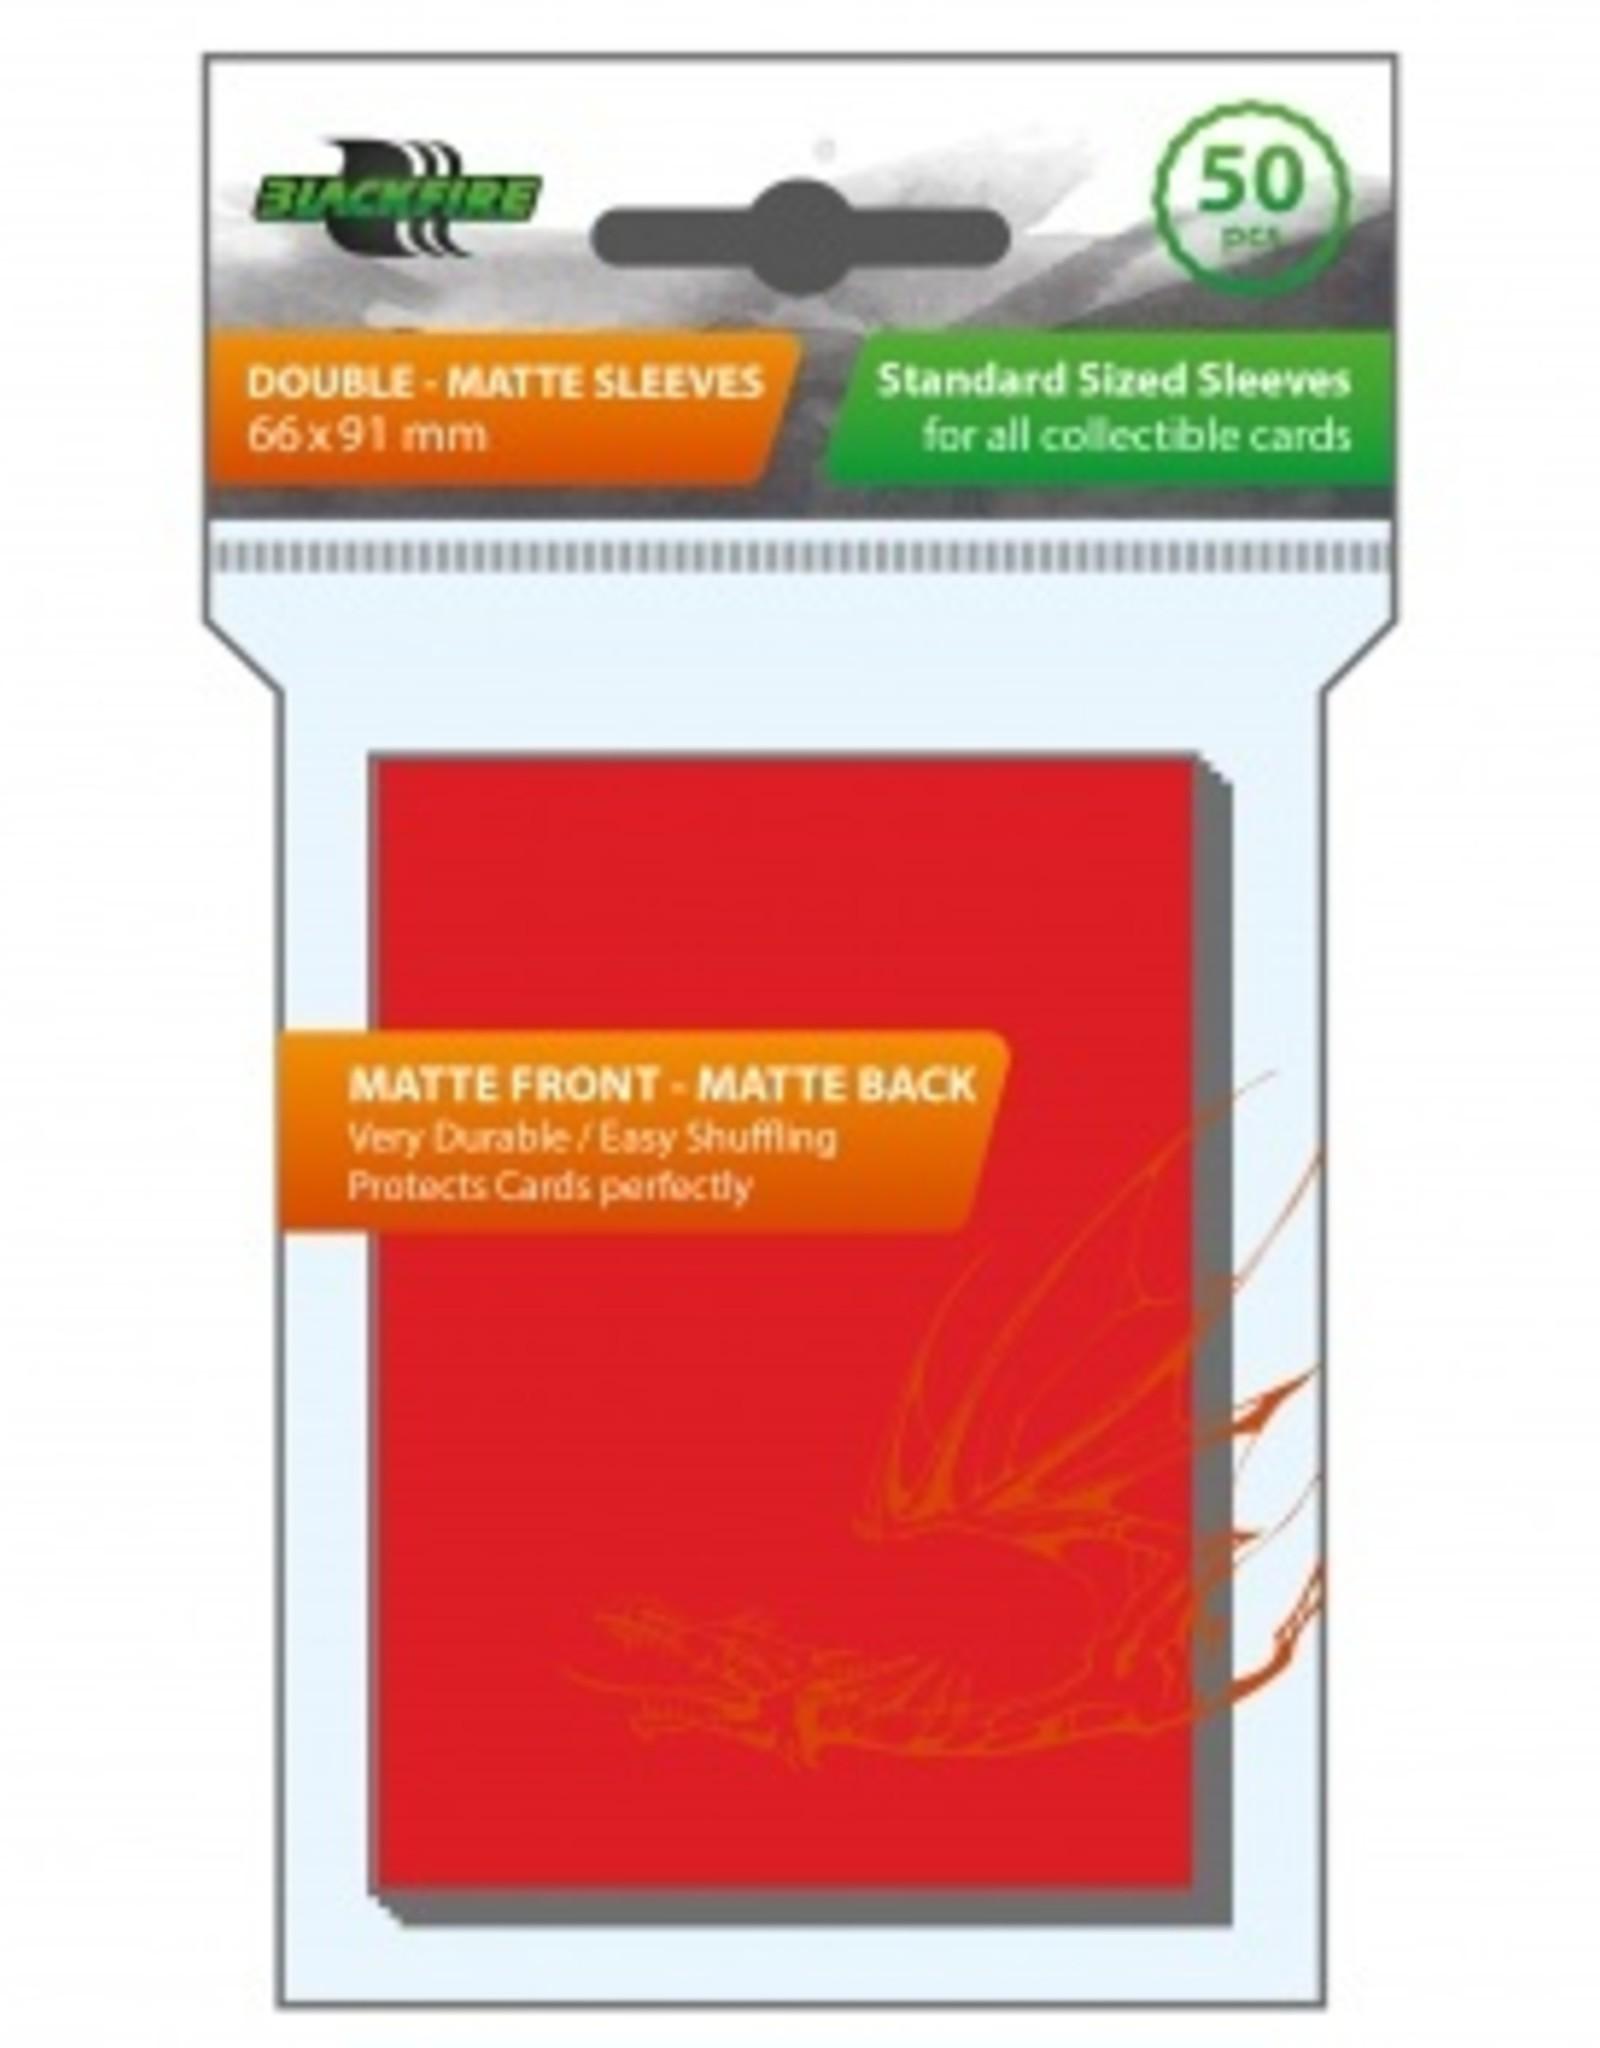 ADC Blackfire Blackfire Sleeves Standard Double Matte Red (50) (66x91mm)